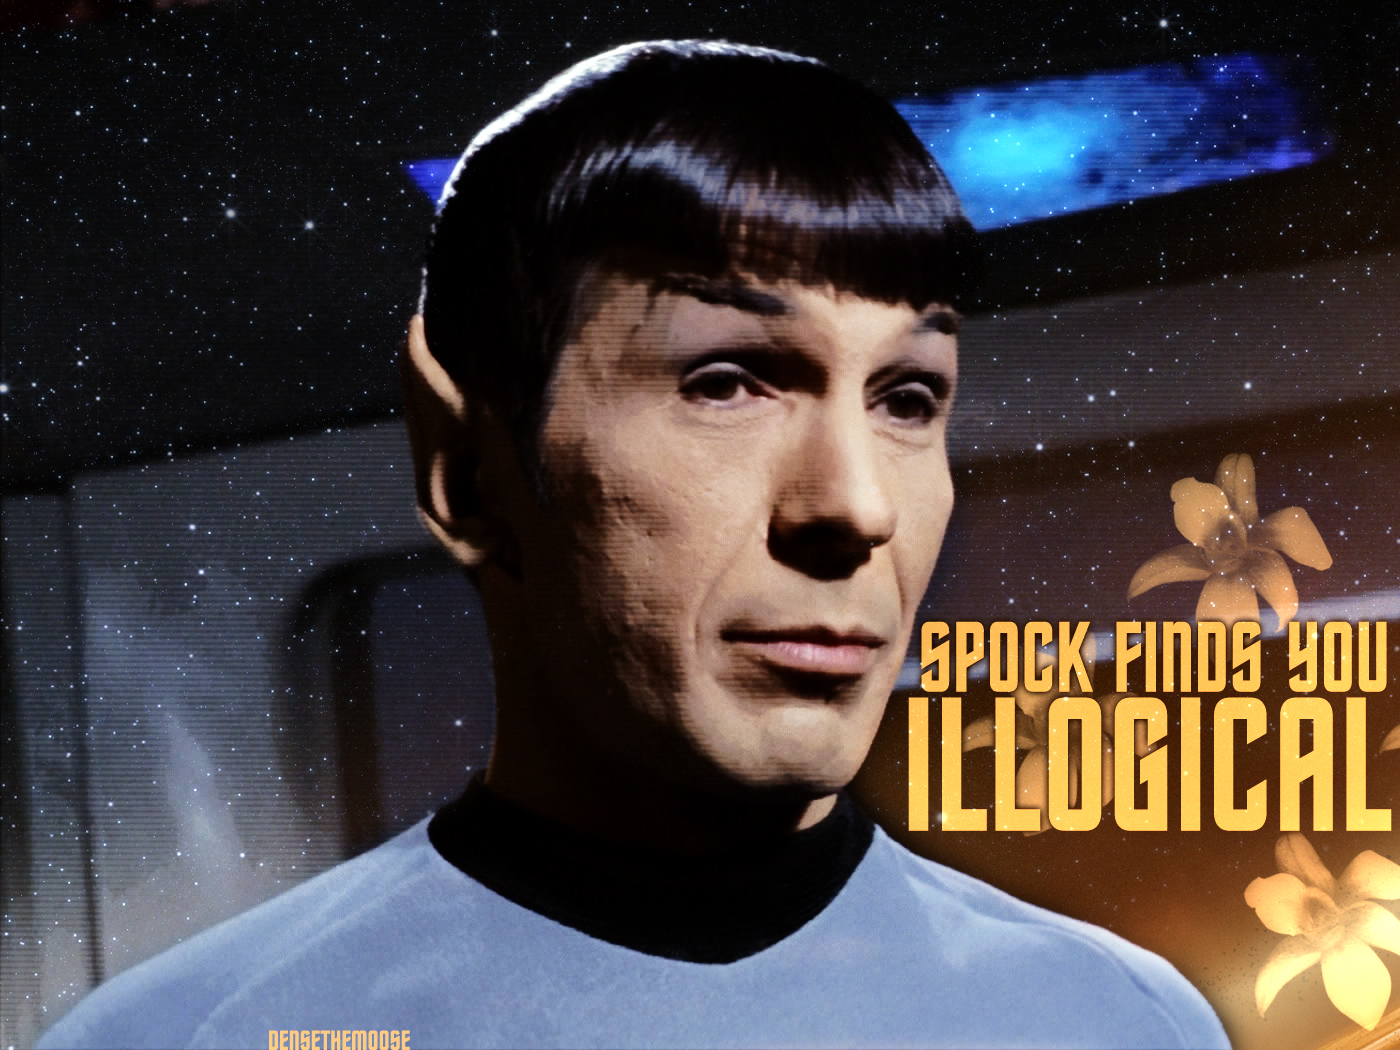 http://fc00.deviantart.net/fs46/f/2009/191/1/1/Spock_Finds_You_Illogical_by_densethemoose.jpg